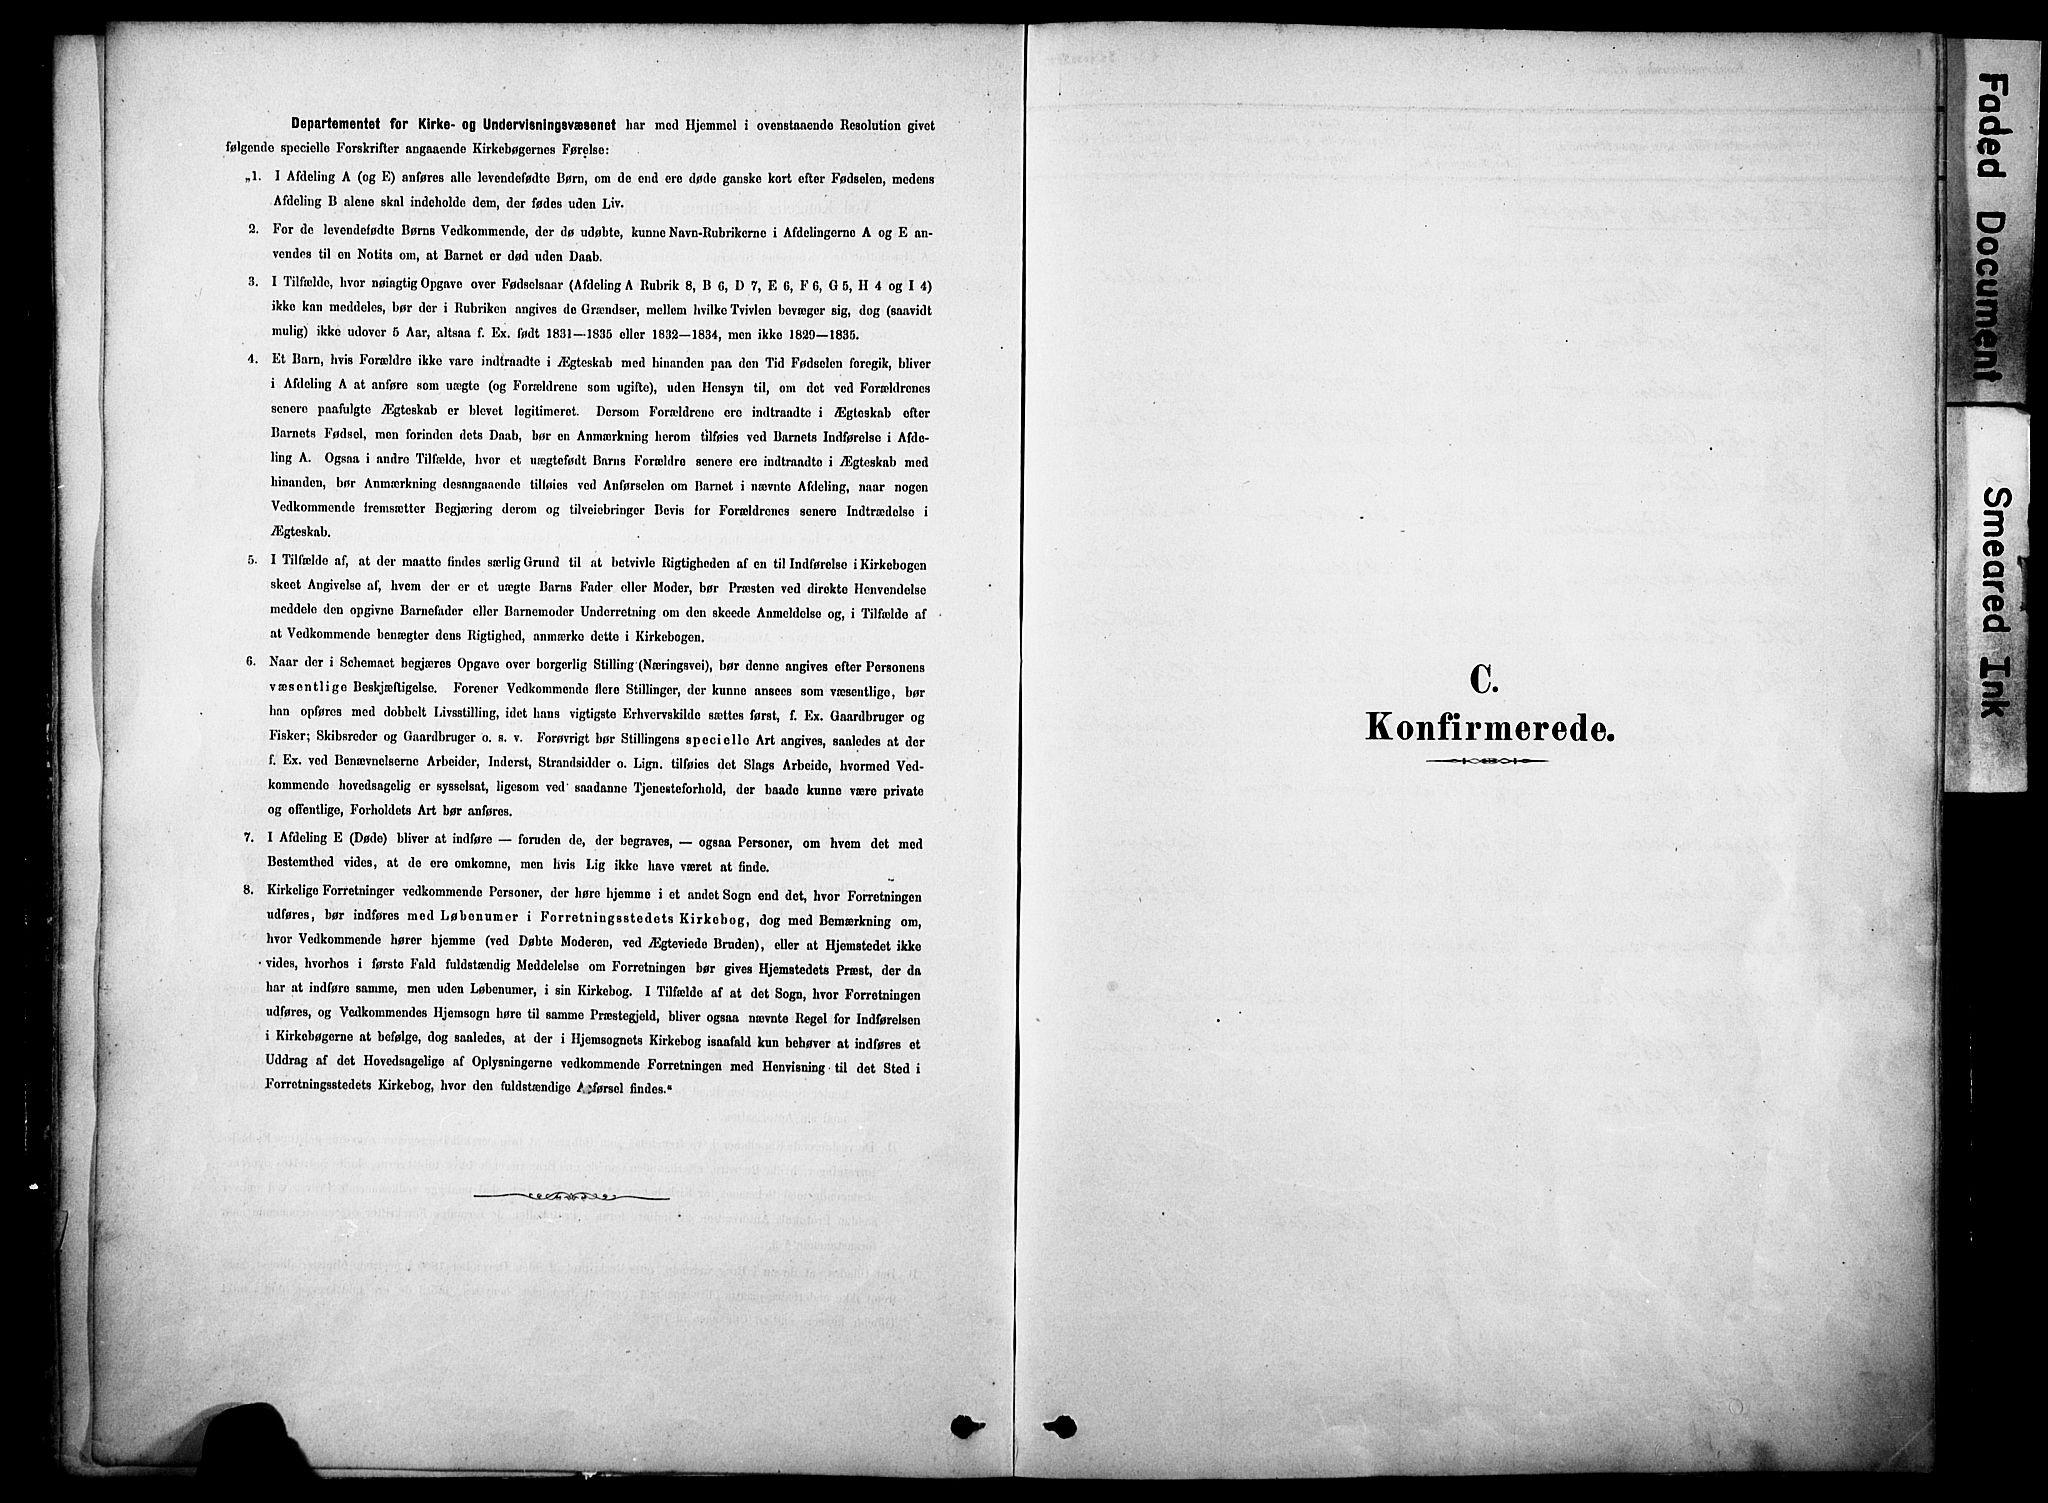 SAH, Skjåk prestekontor, Ministerialbok nr. 2, 1878-1907